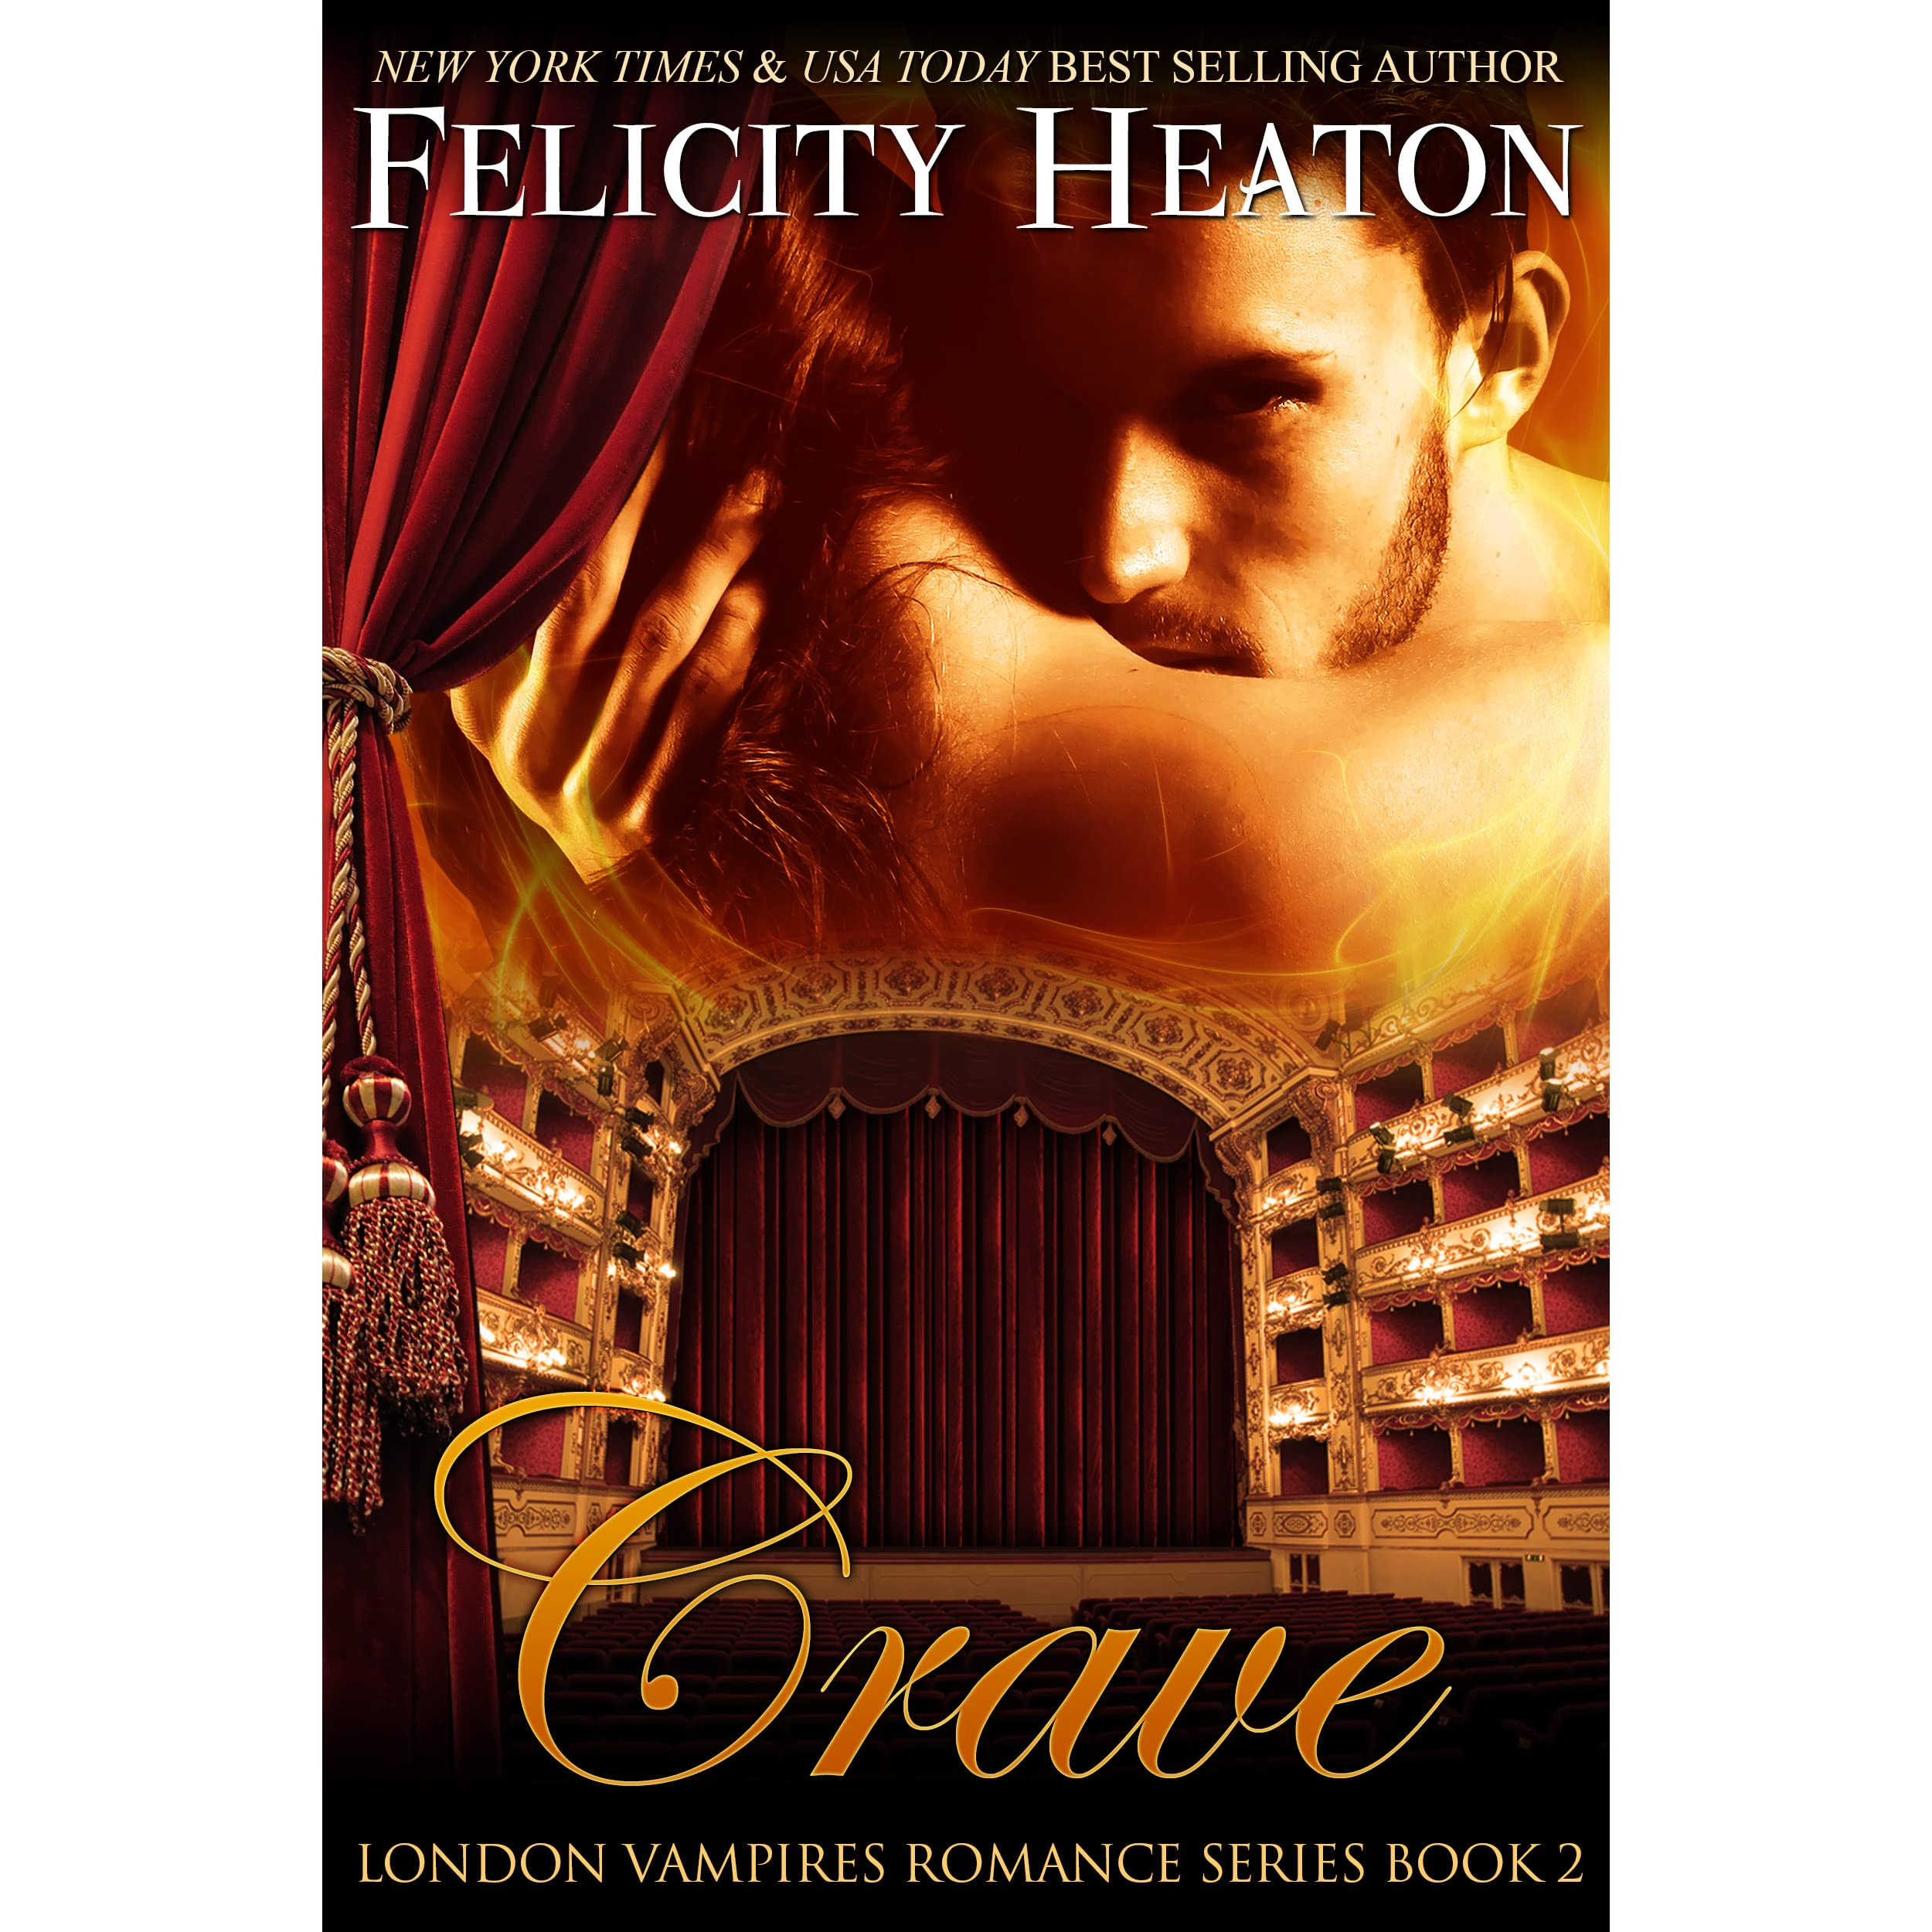 An Erotic Werewolf In London crave (london vampires, #2)felicity heaton